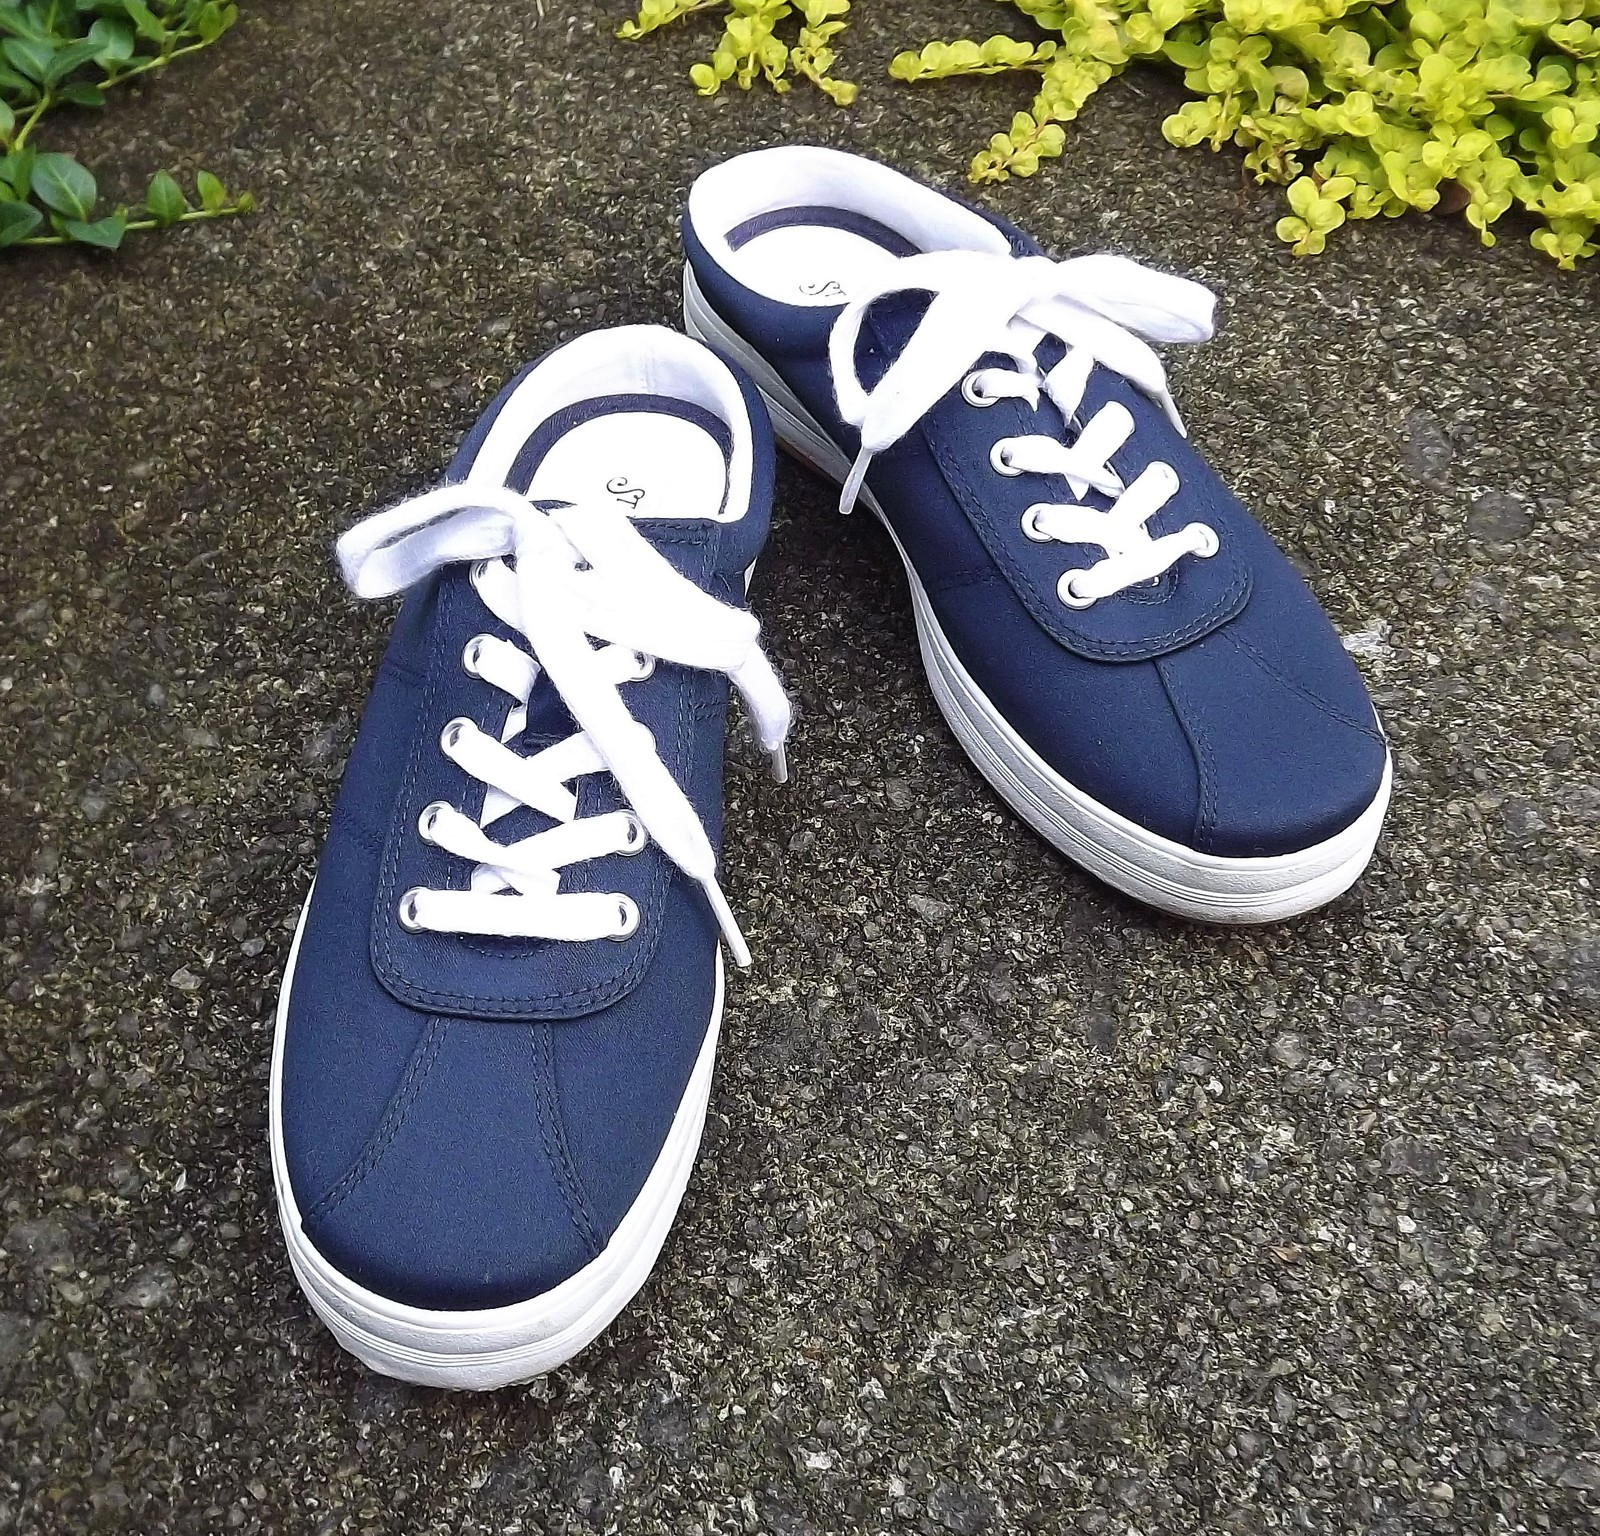 7d618a836d2 Navy Blue Canvas Slingback Open Heel Lace Up Tennis Shoe Women US Size 8  Medium